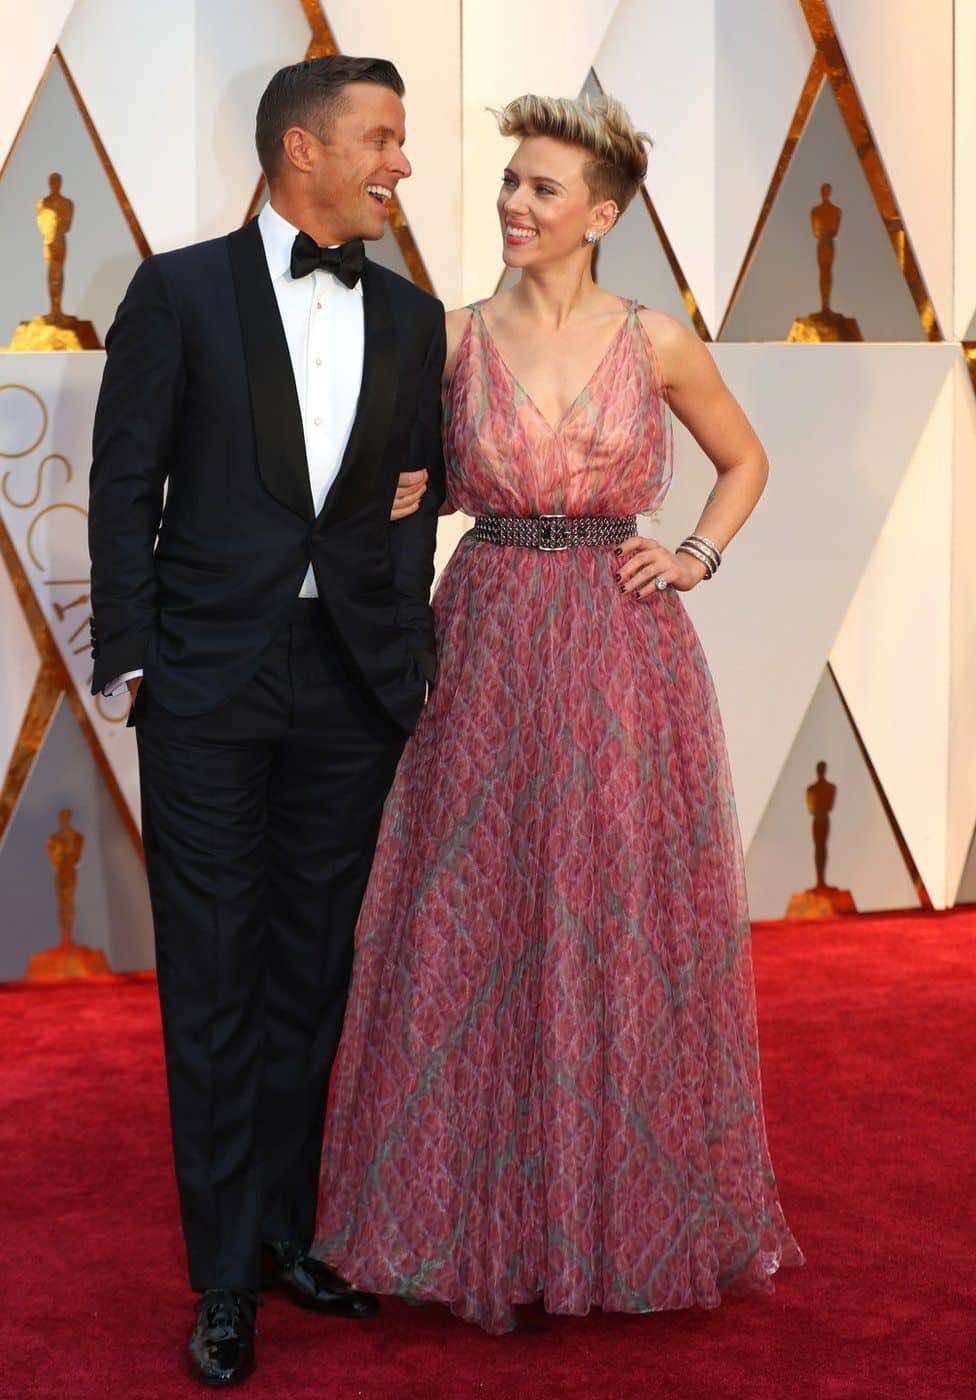 Actress Scarlett Johansson with her husband Romain Dauriac.